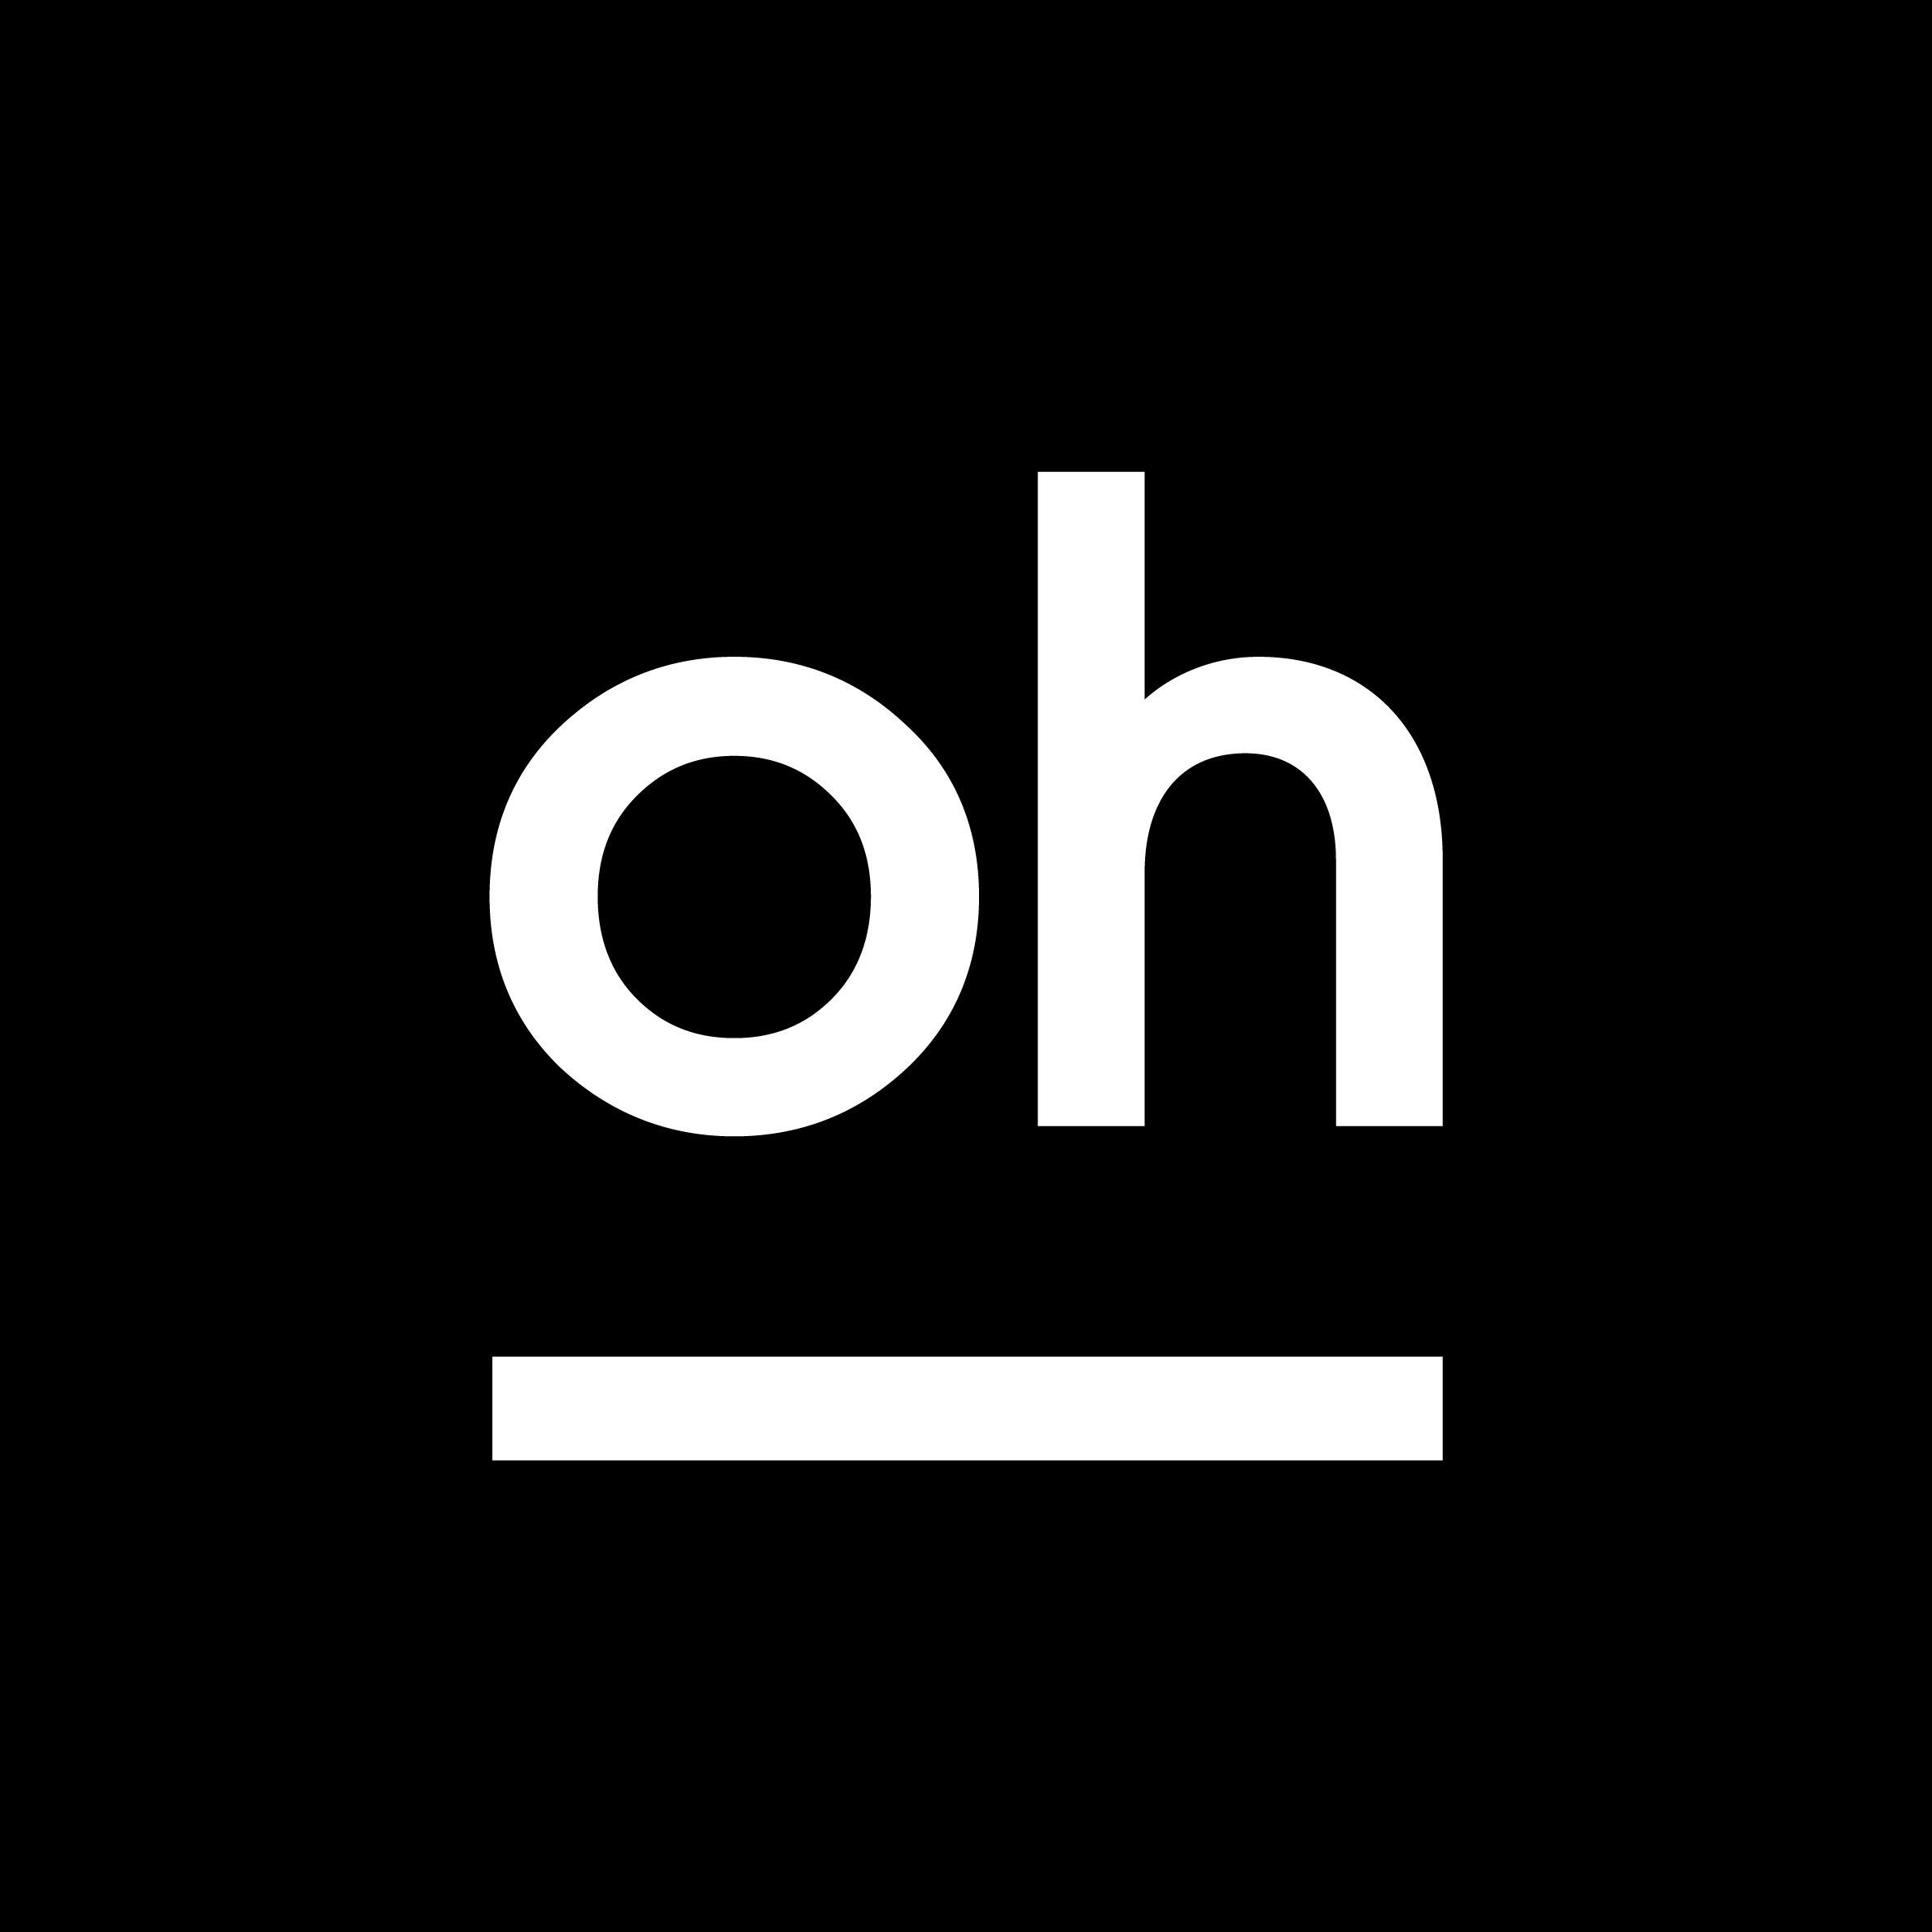 Onlyhumans logo